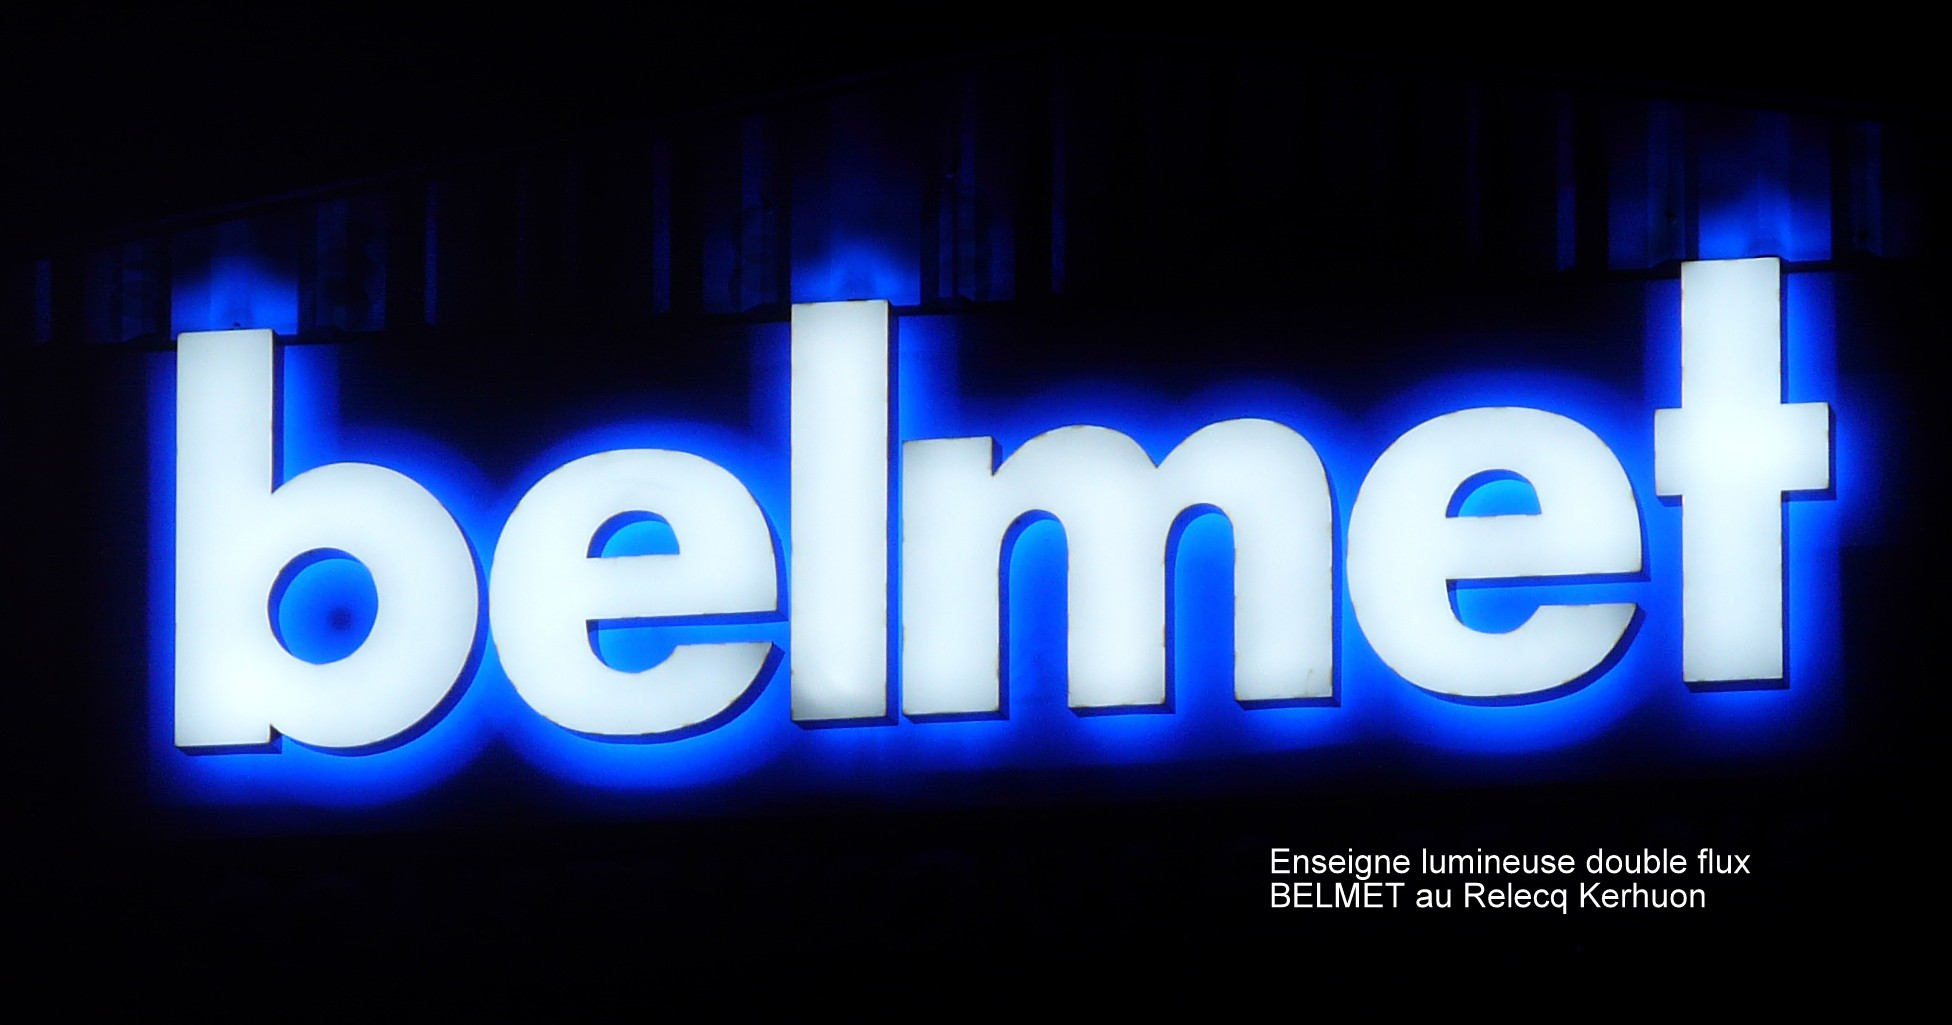 Belmet_nuit_1_1279X671-478